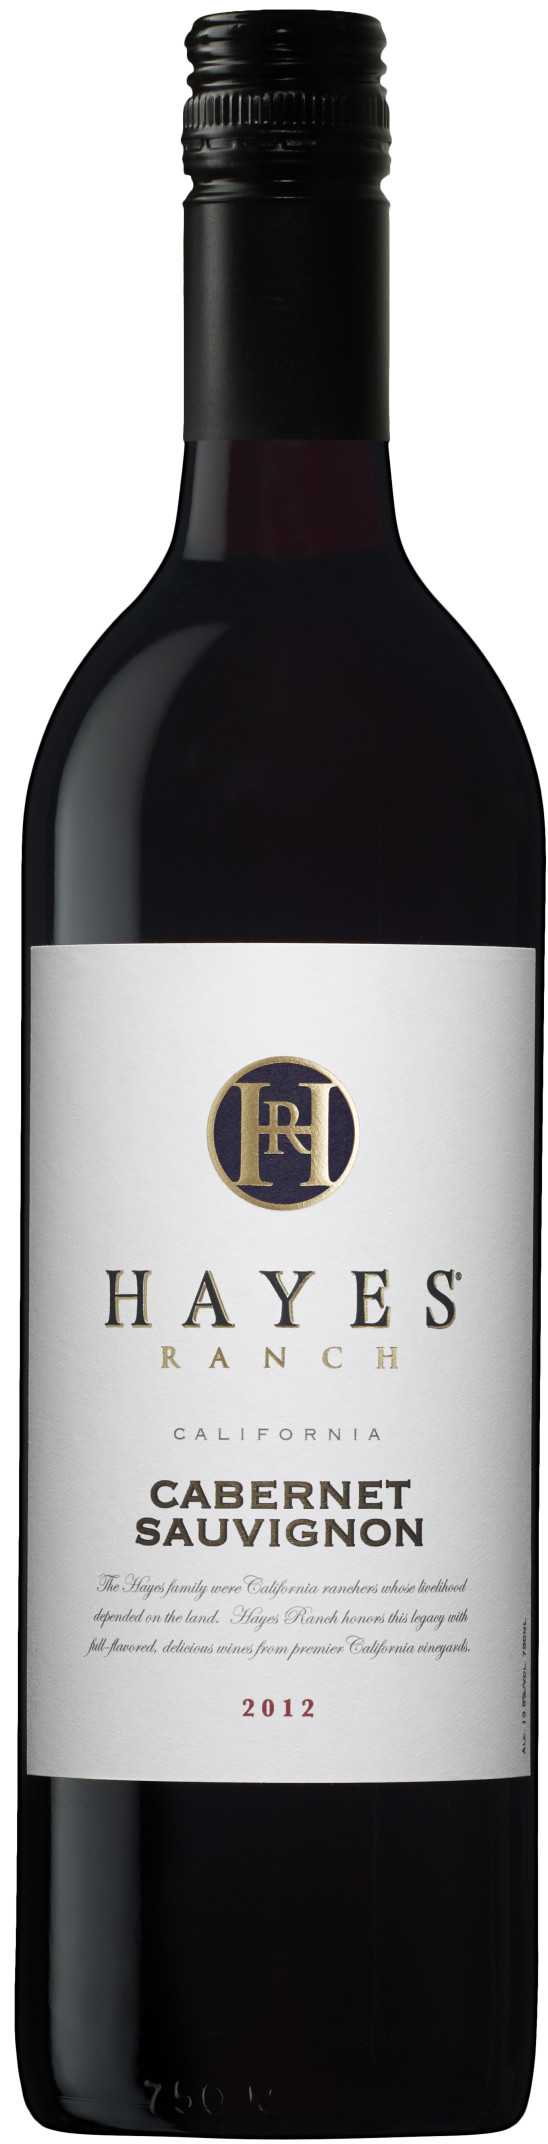 Hayes Ranch Cabernet Sauvignon